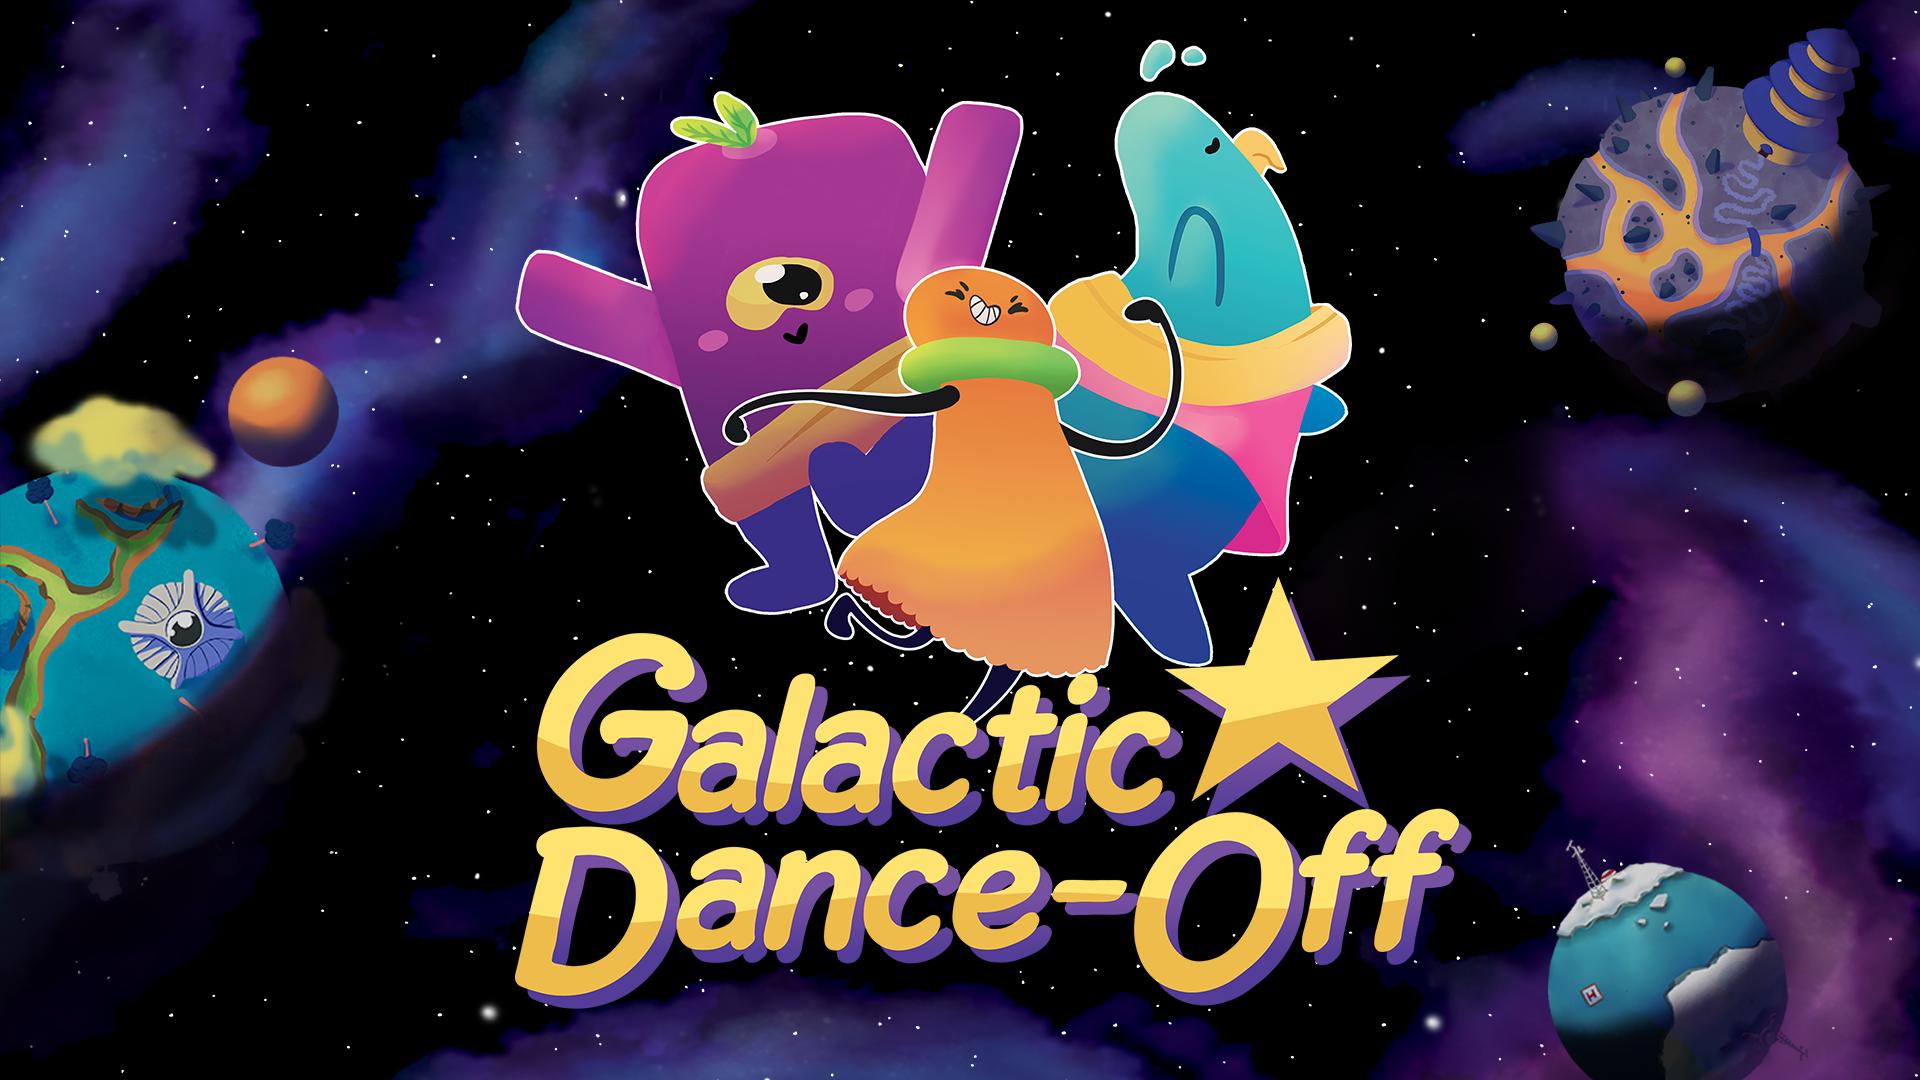 Galactic Dance-Off